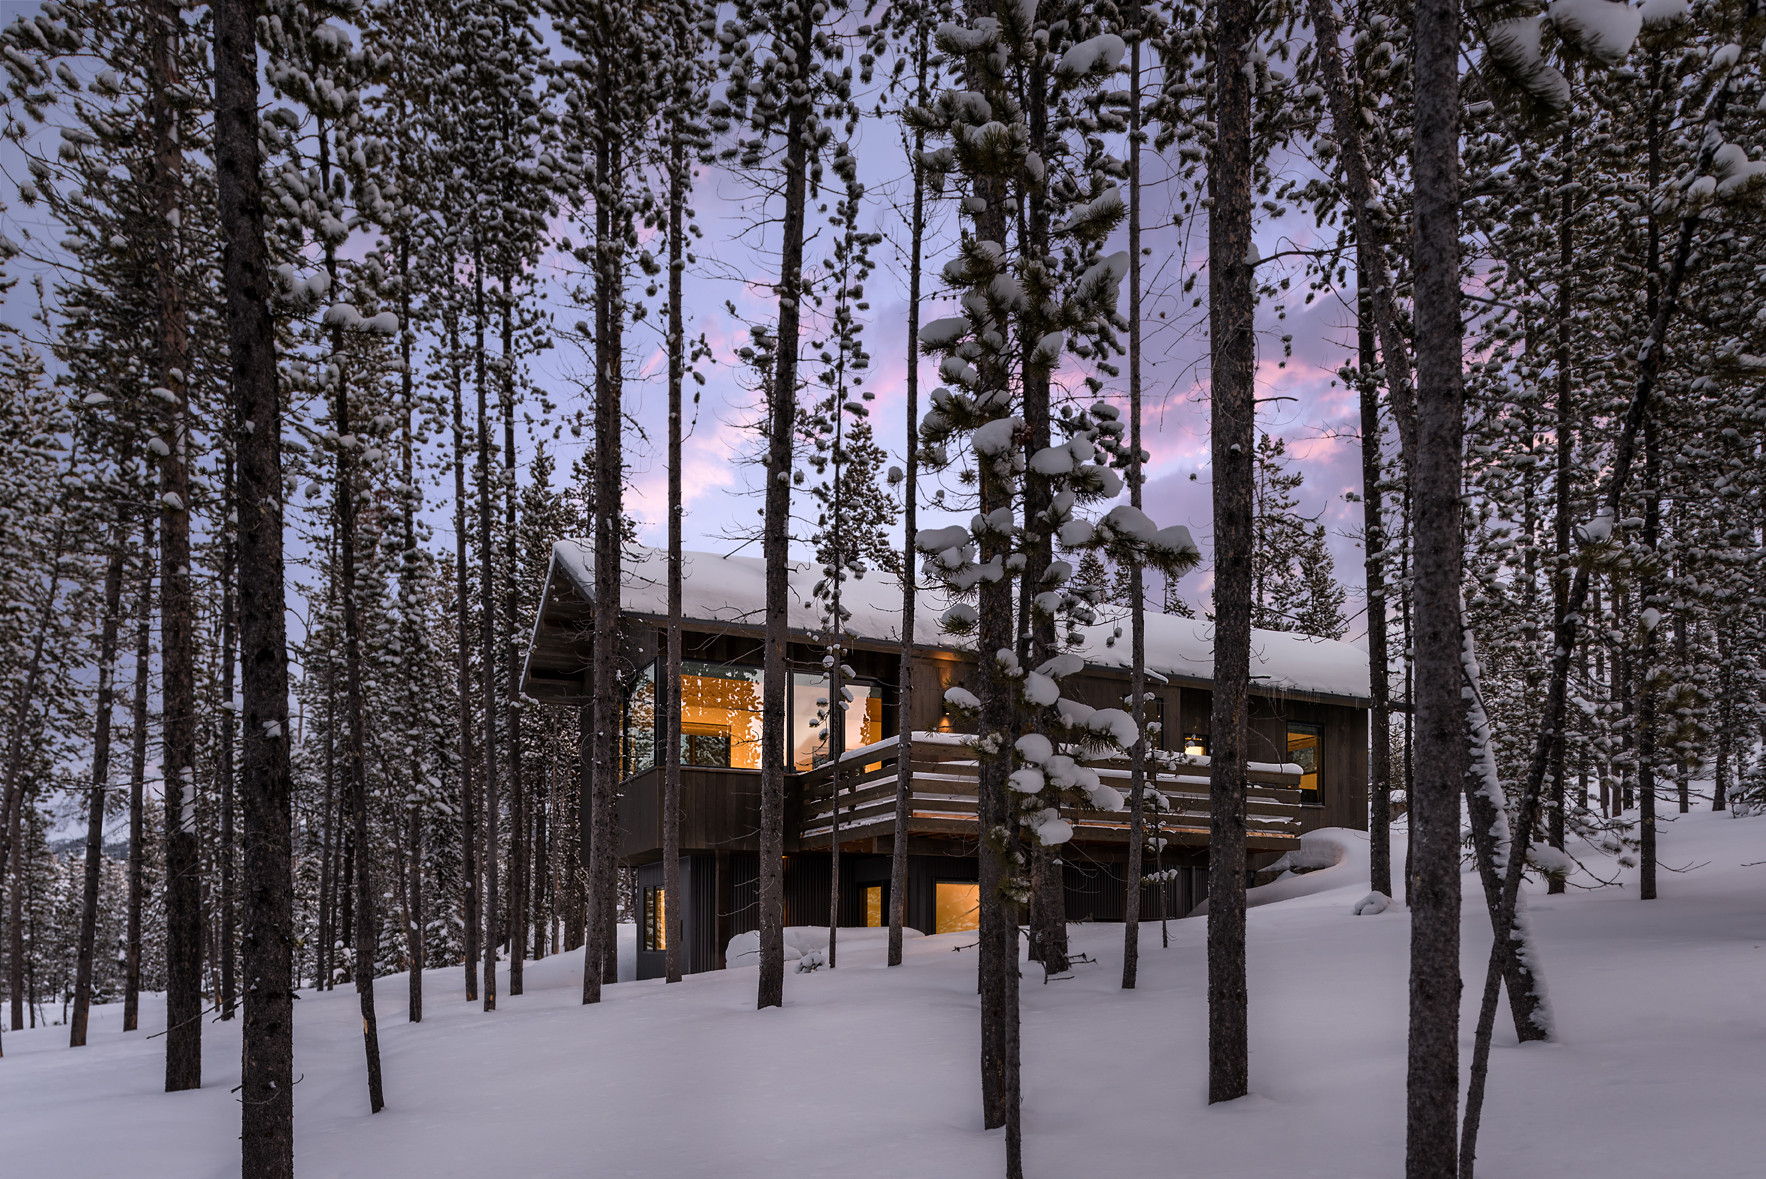 Low Resolution Lake Cabins 1.jpg